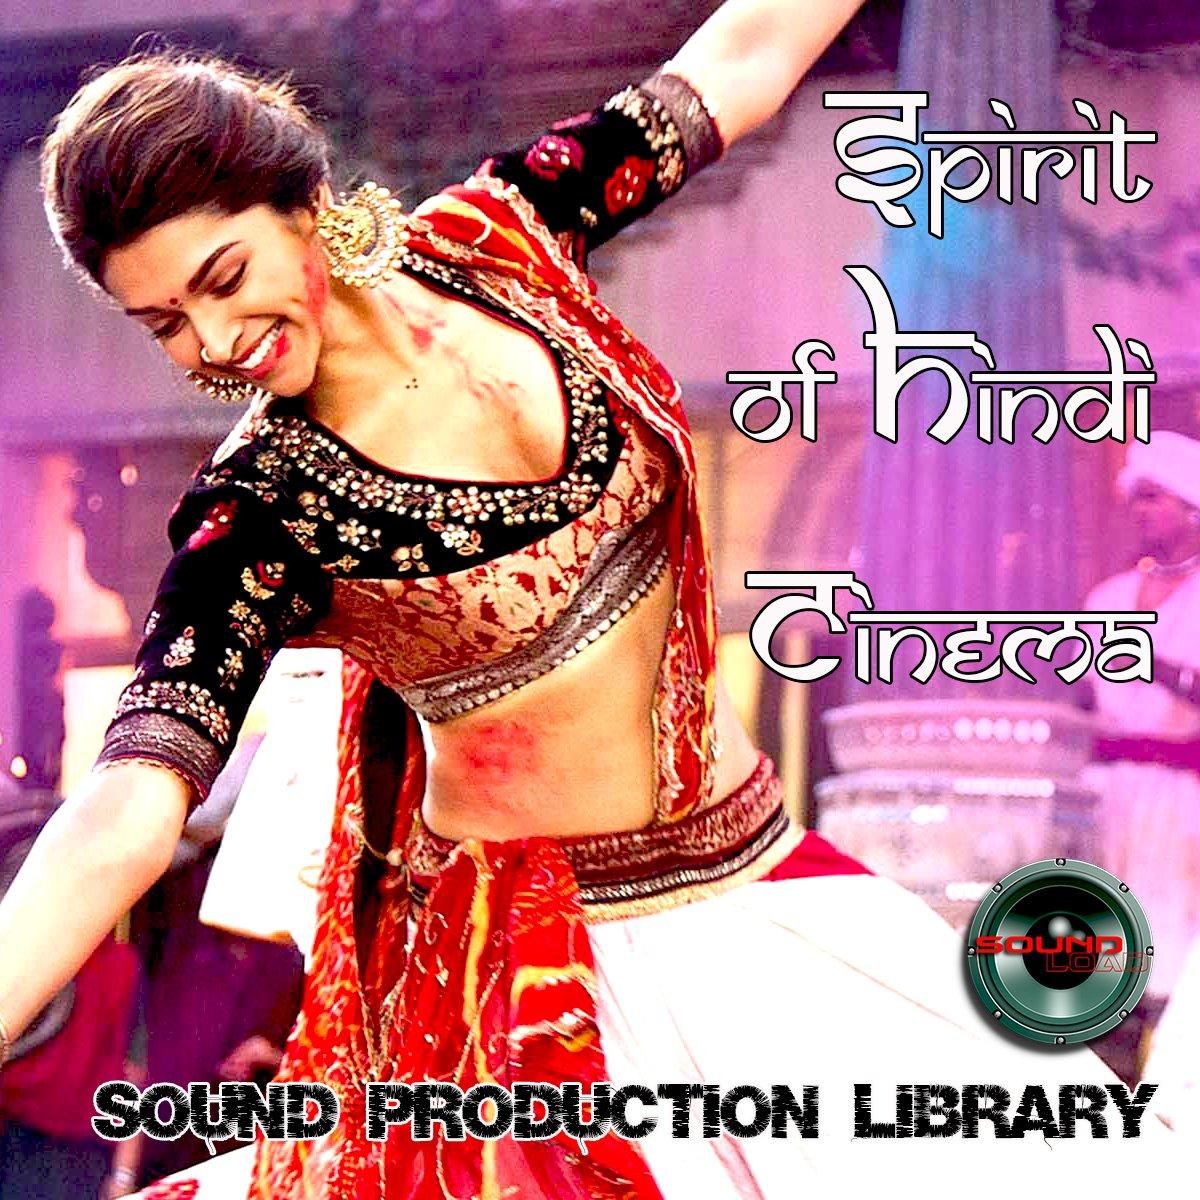 HINDI CINEMA SPIRIT - unique original Multi-Layer Studio Samples Library on DVD